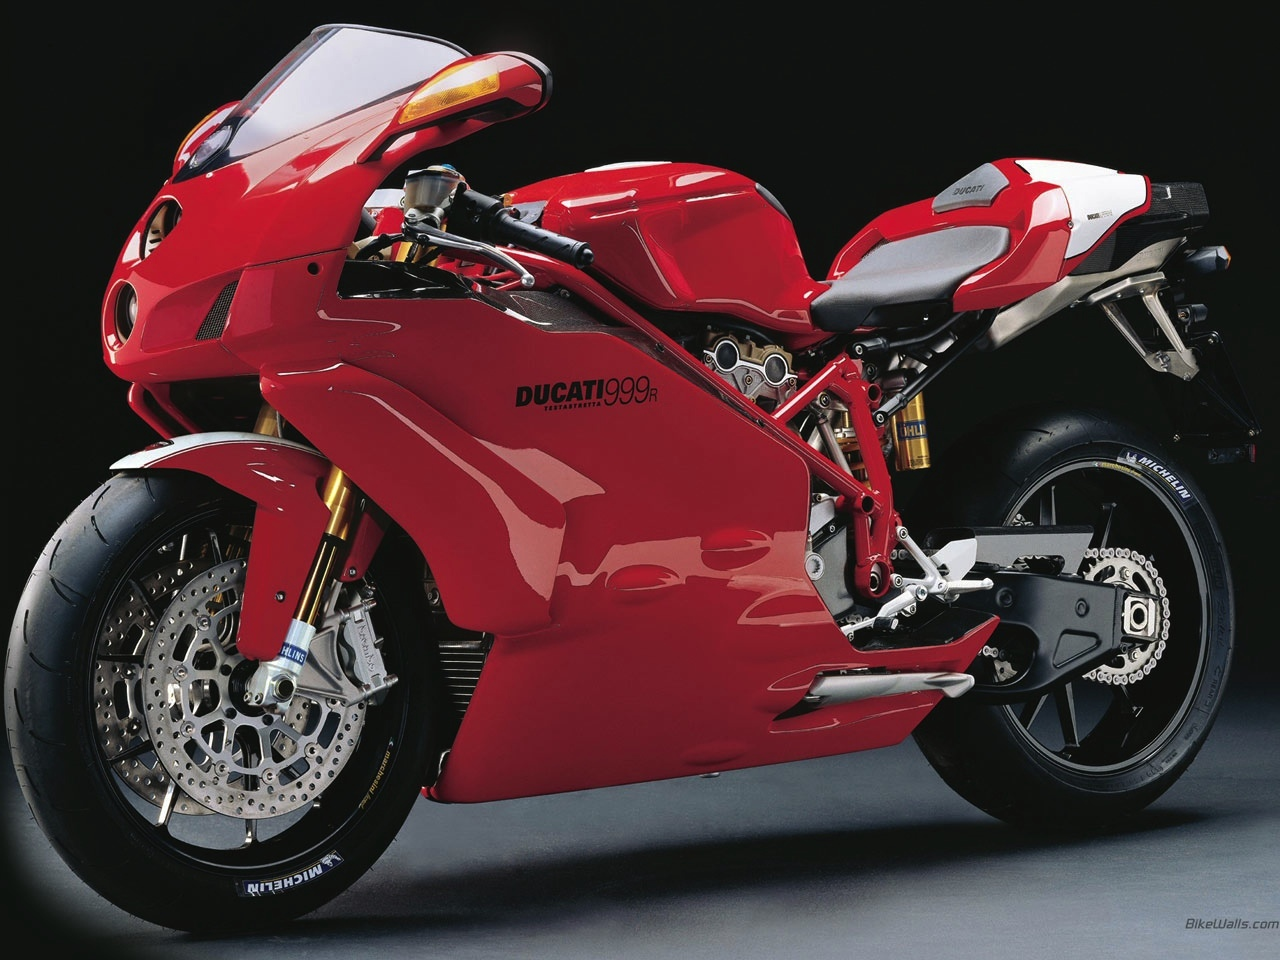 Only Wallpapers: Ducati 999 HD Wallpaper